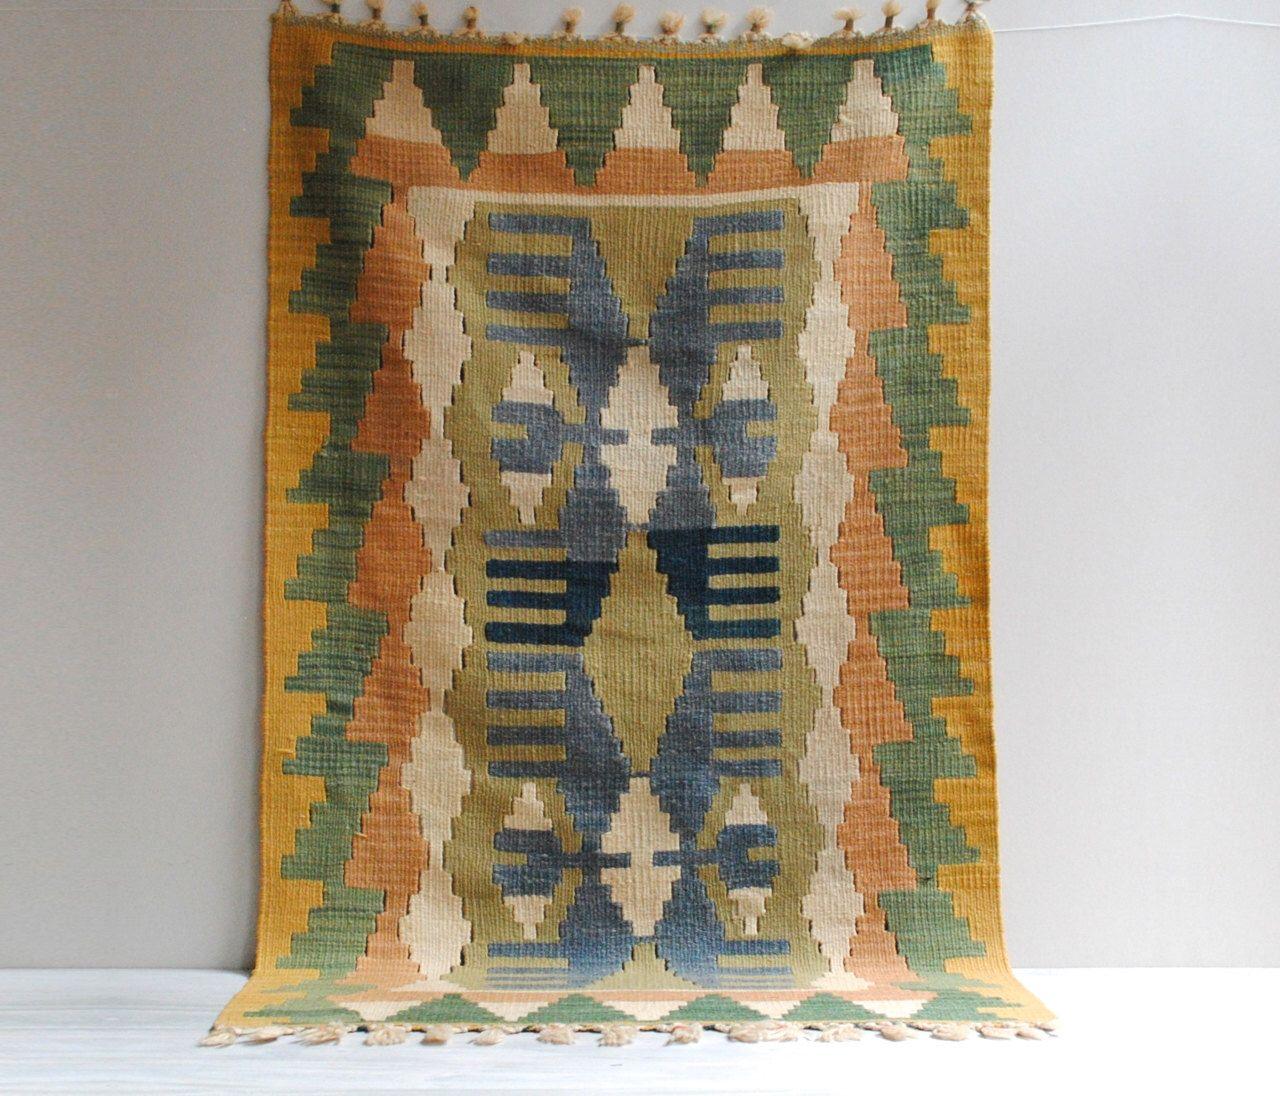 Vintage Kayseri Pınarbasi Kilim Throw Rug or Wall Hanging  /  4' x 2.5' by LittleDogVintage on Etsy https://www.etsy.com/listing/197655424/vintage-kayseri-pnarbasi-kilim-throw-rug